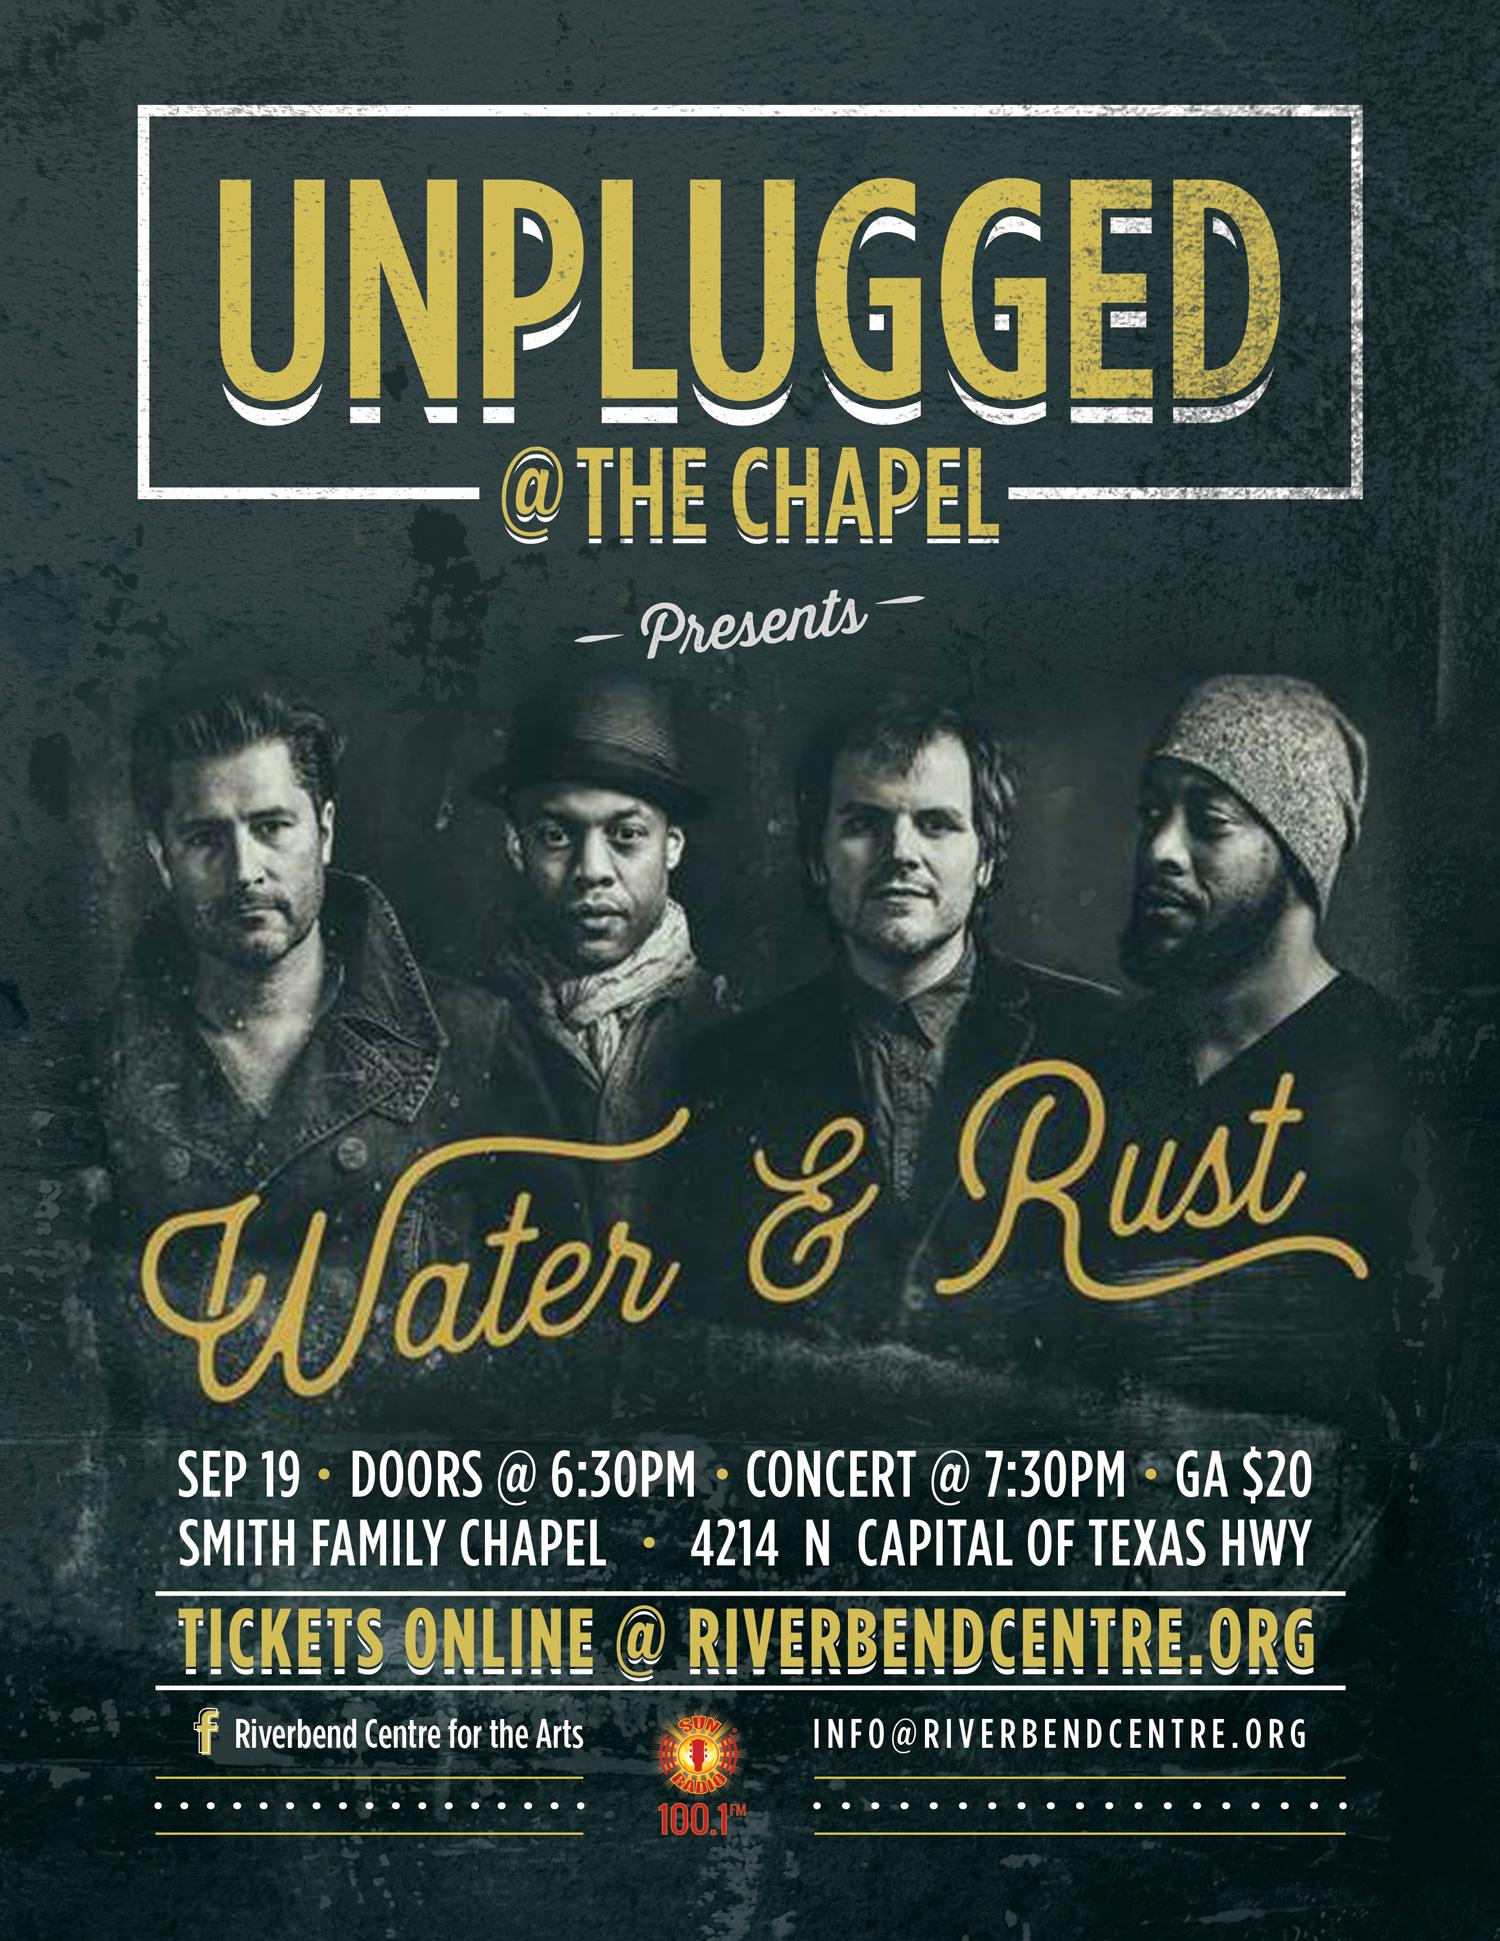 Unplugged_Water&Rust_8.5x11.jpg